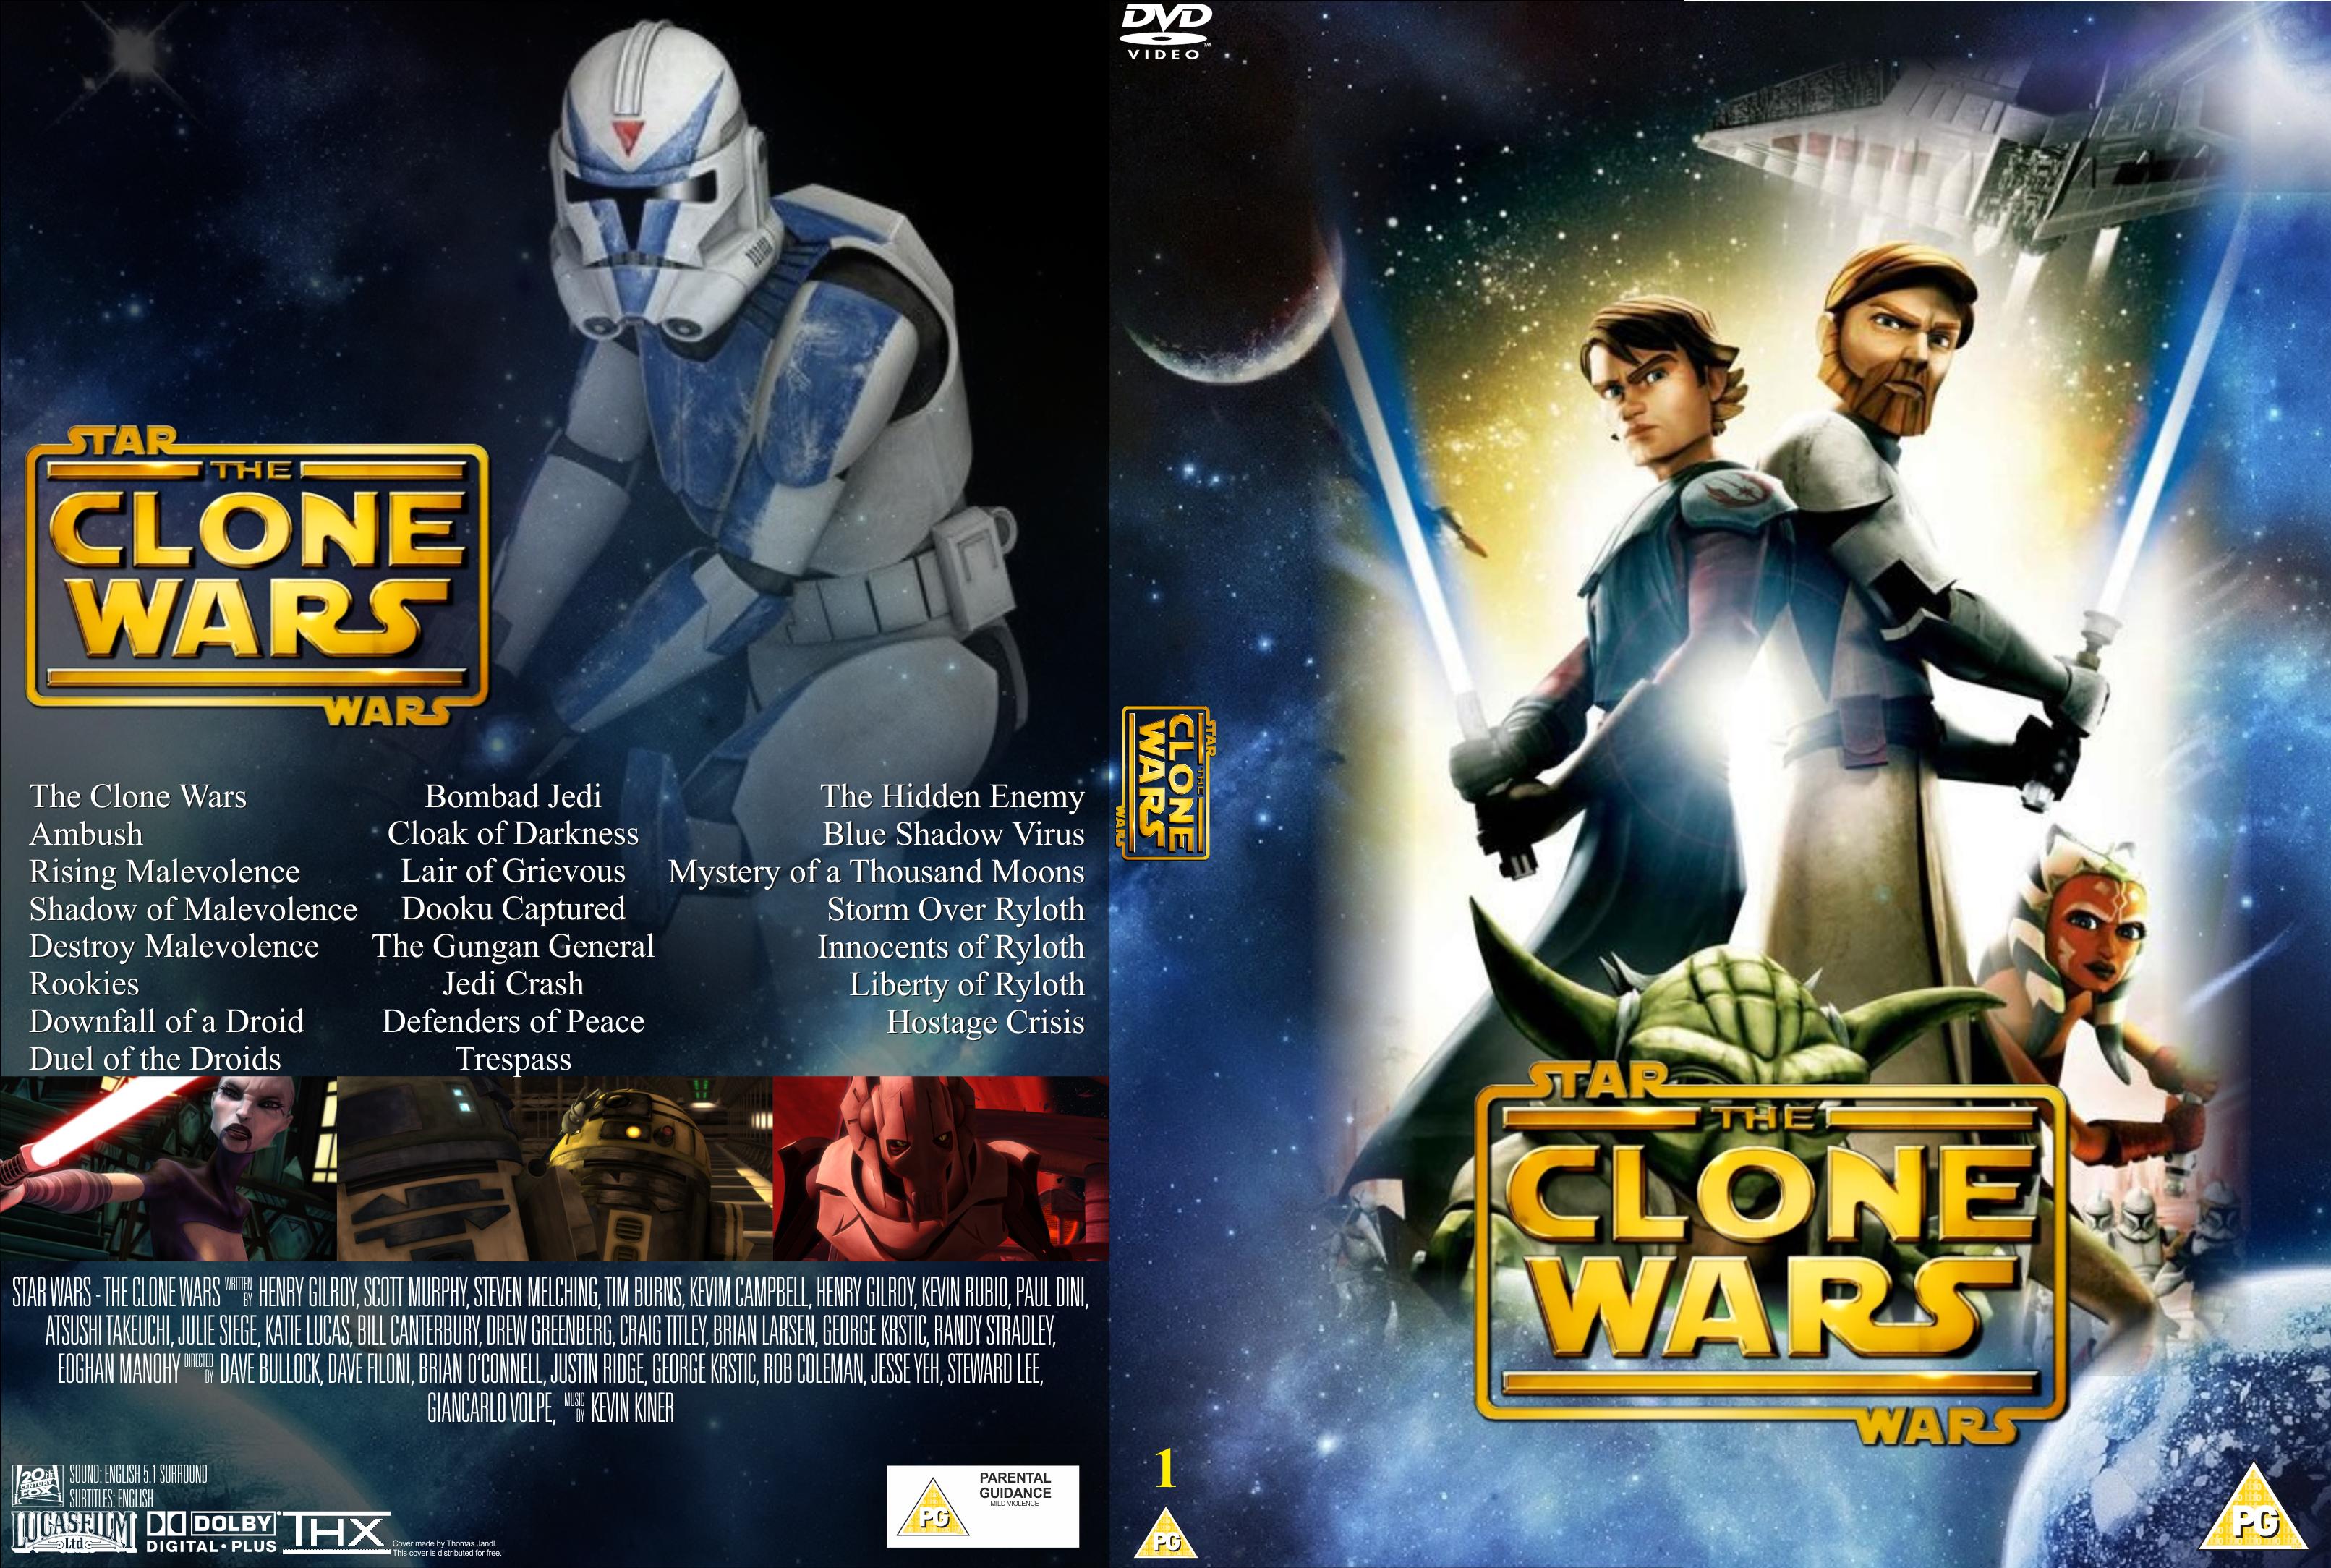 star wars dvd covers original trilogy